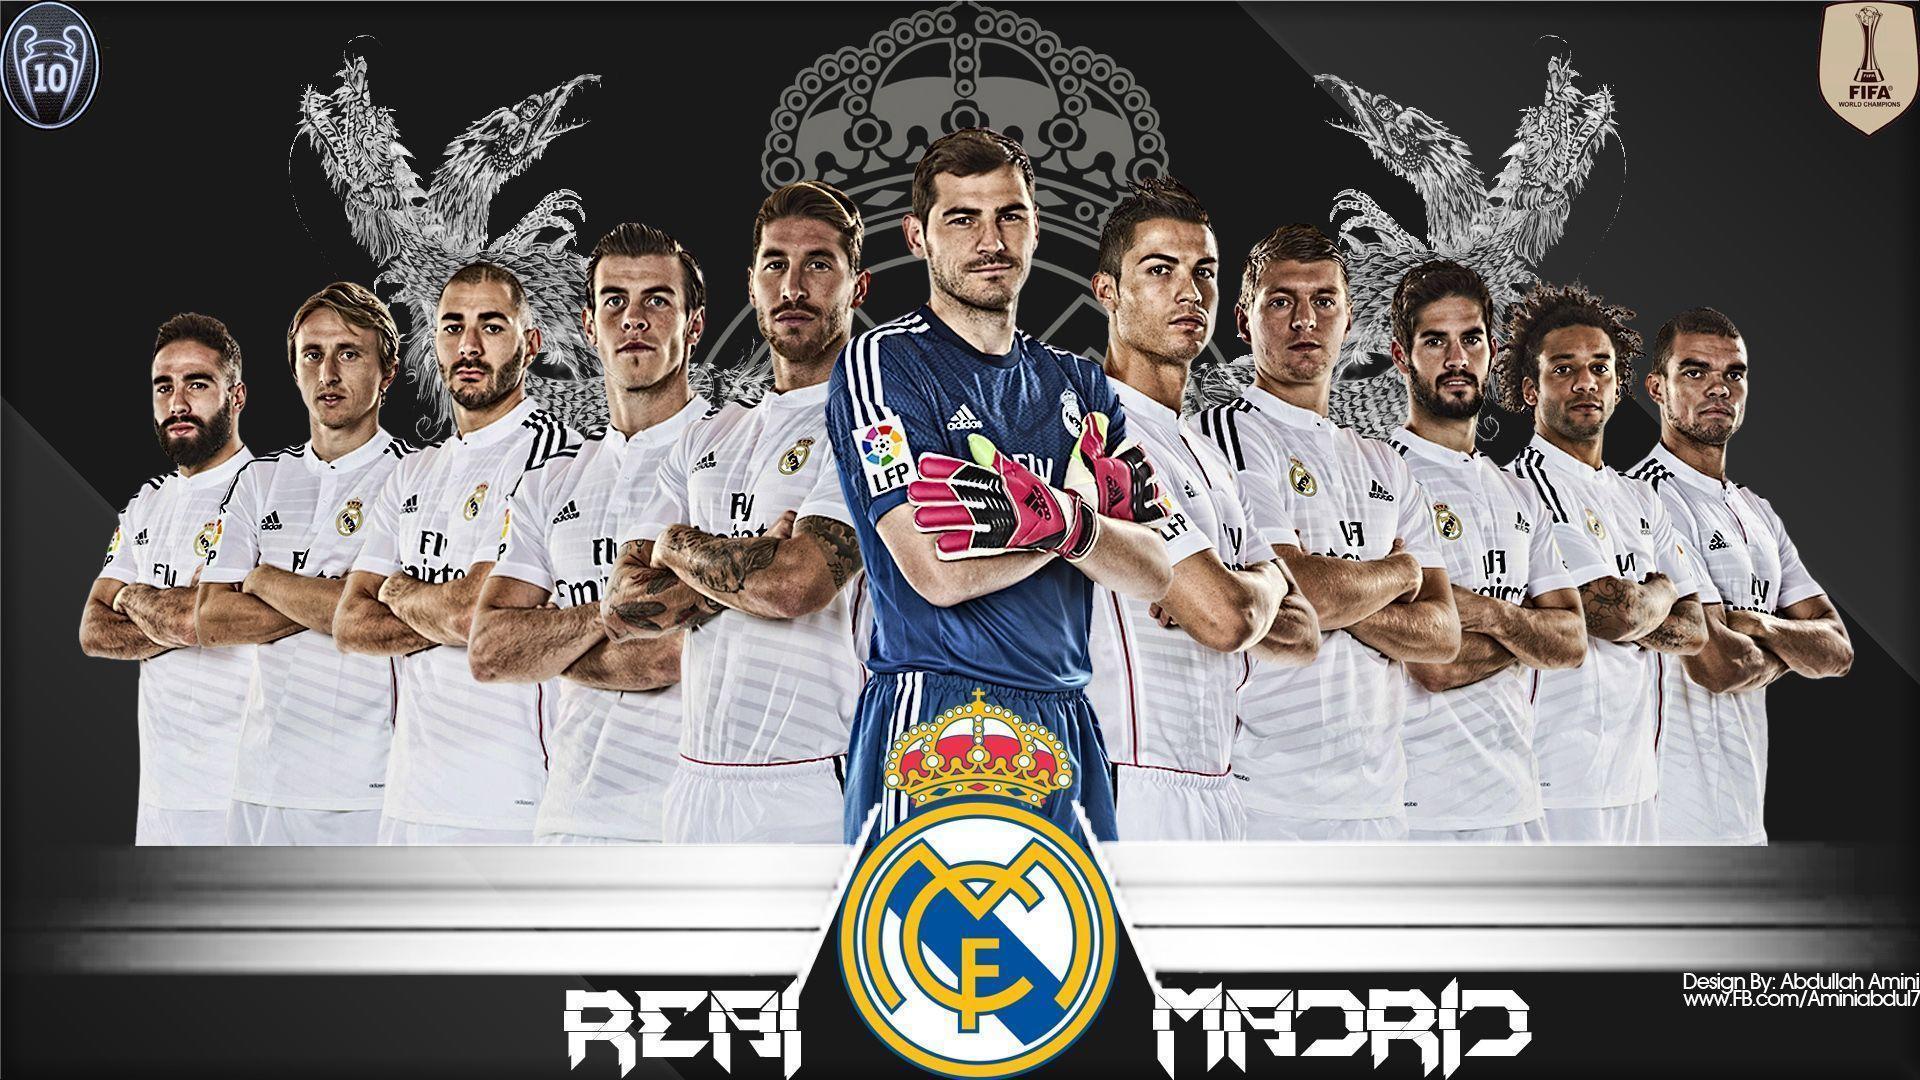 Real Madrid: Real Madrid Logo Wallpapers 2017 HD